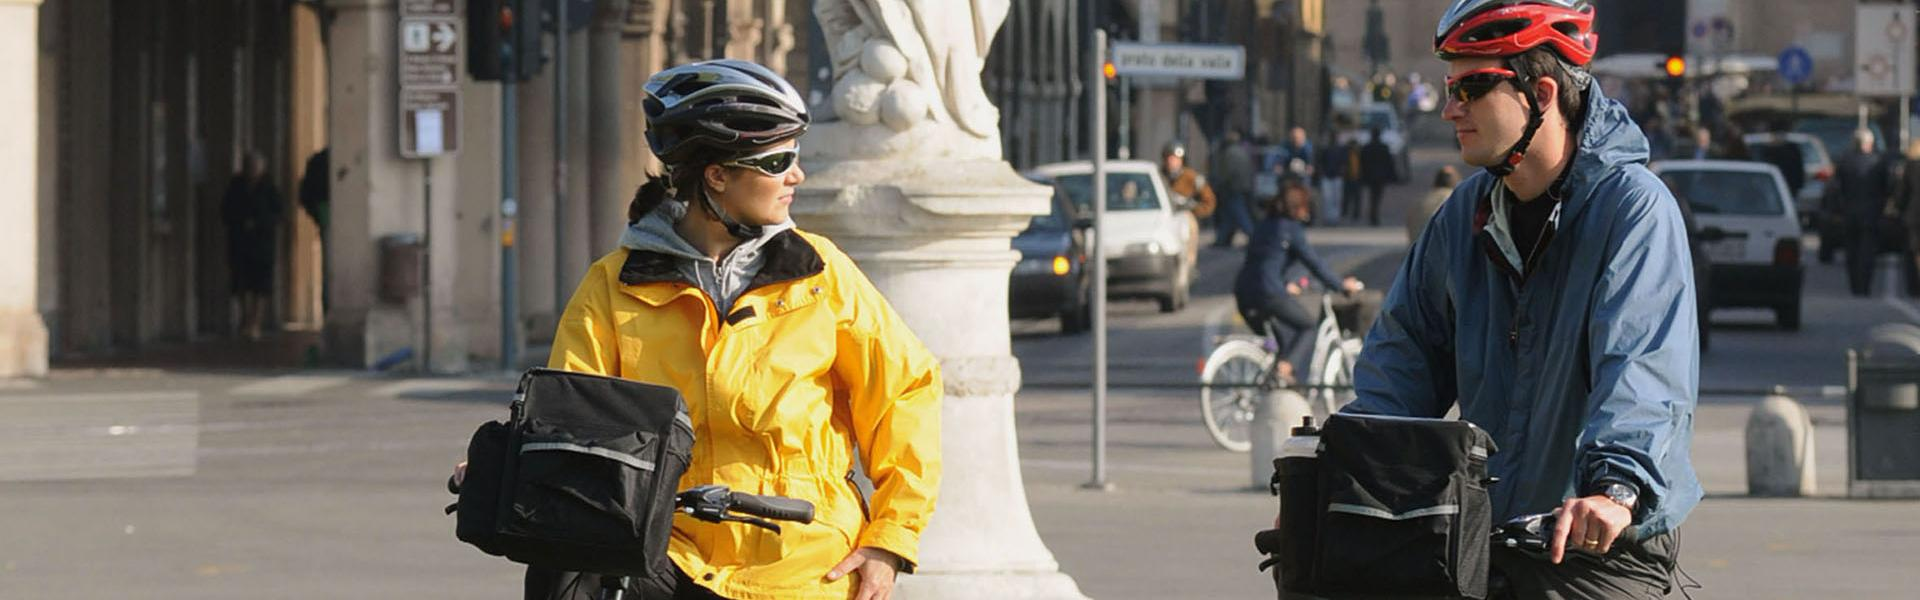 Padova Travel Bike basilica del Santo